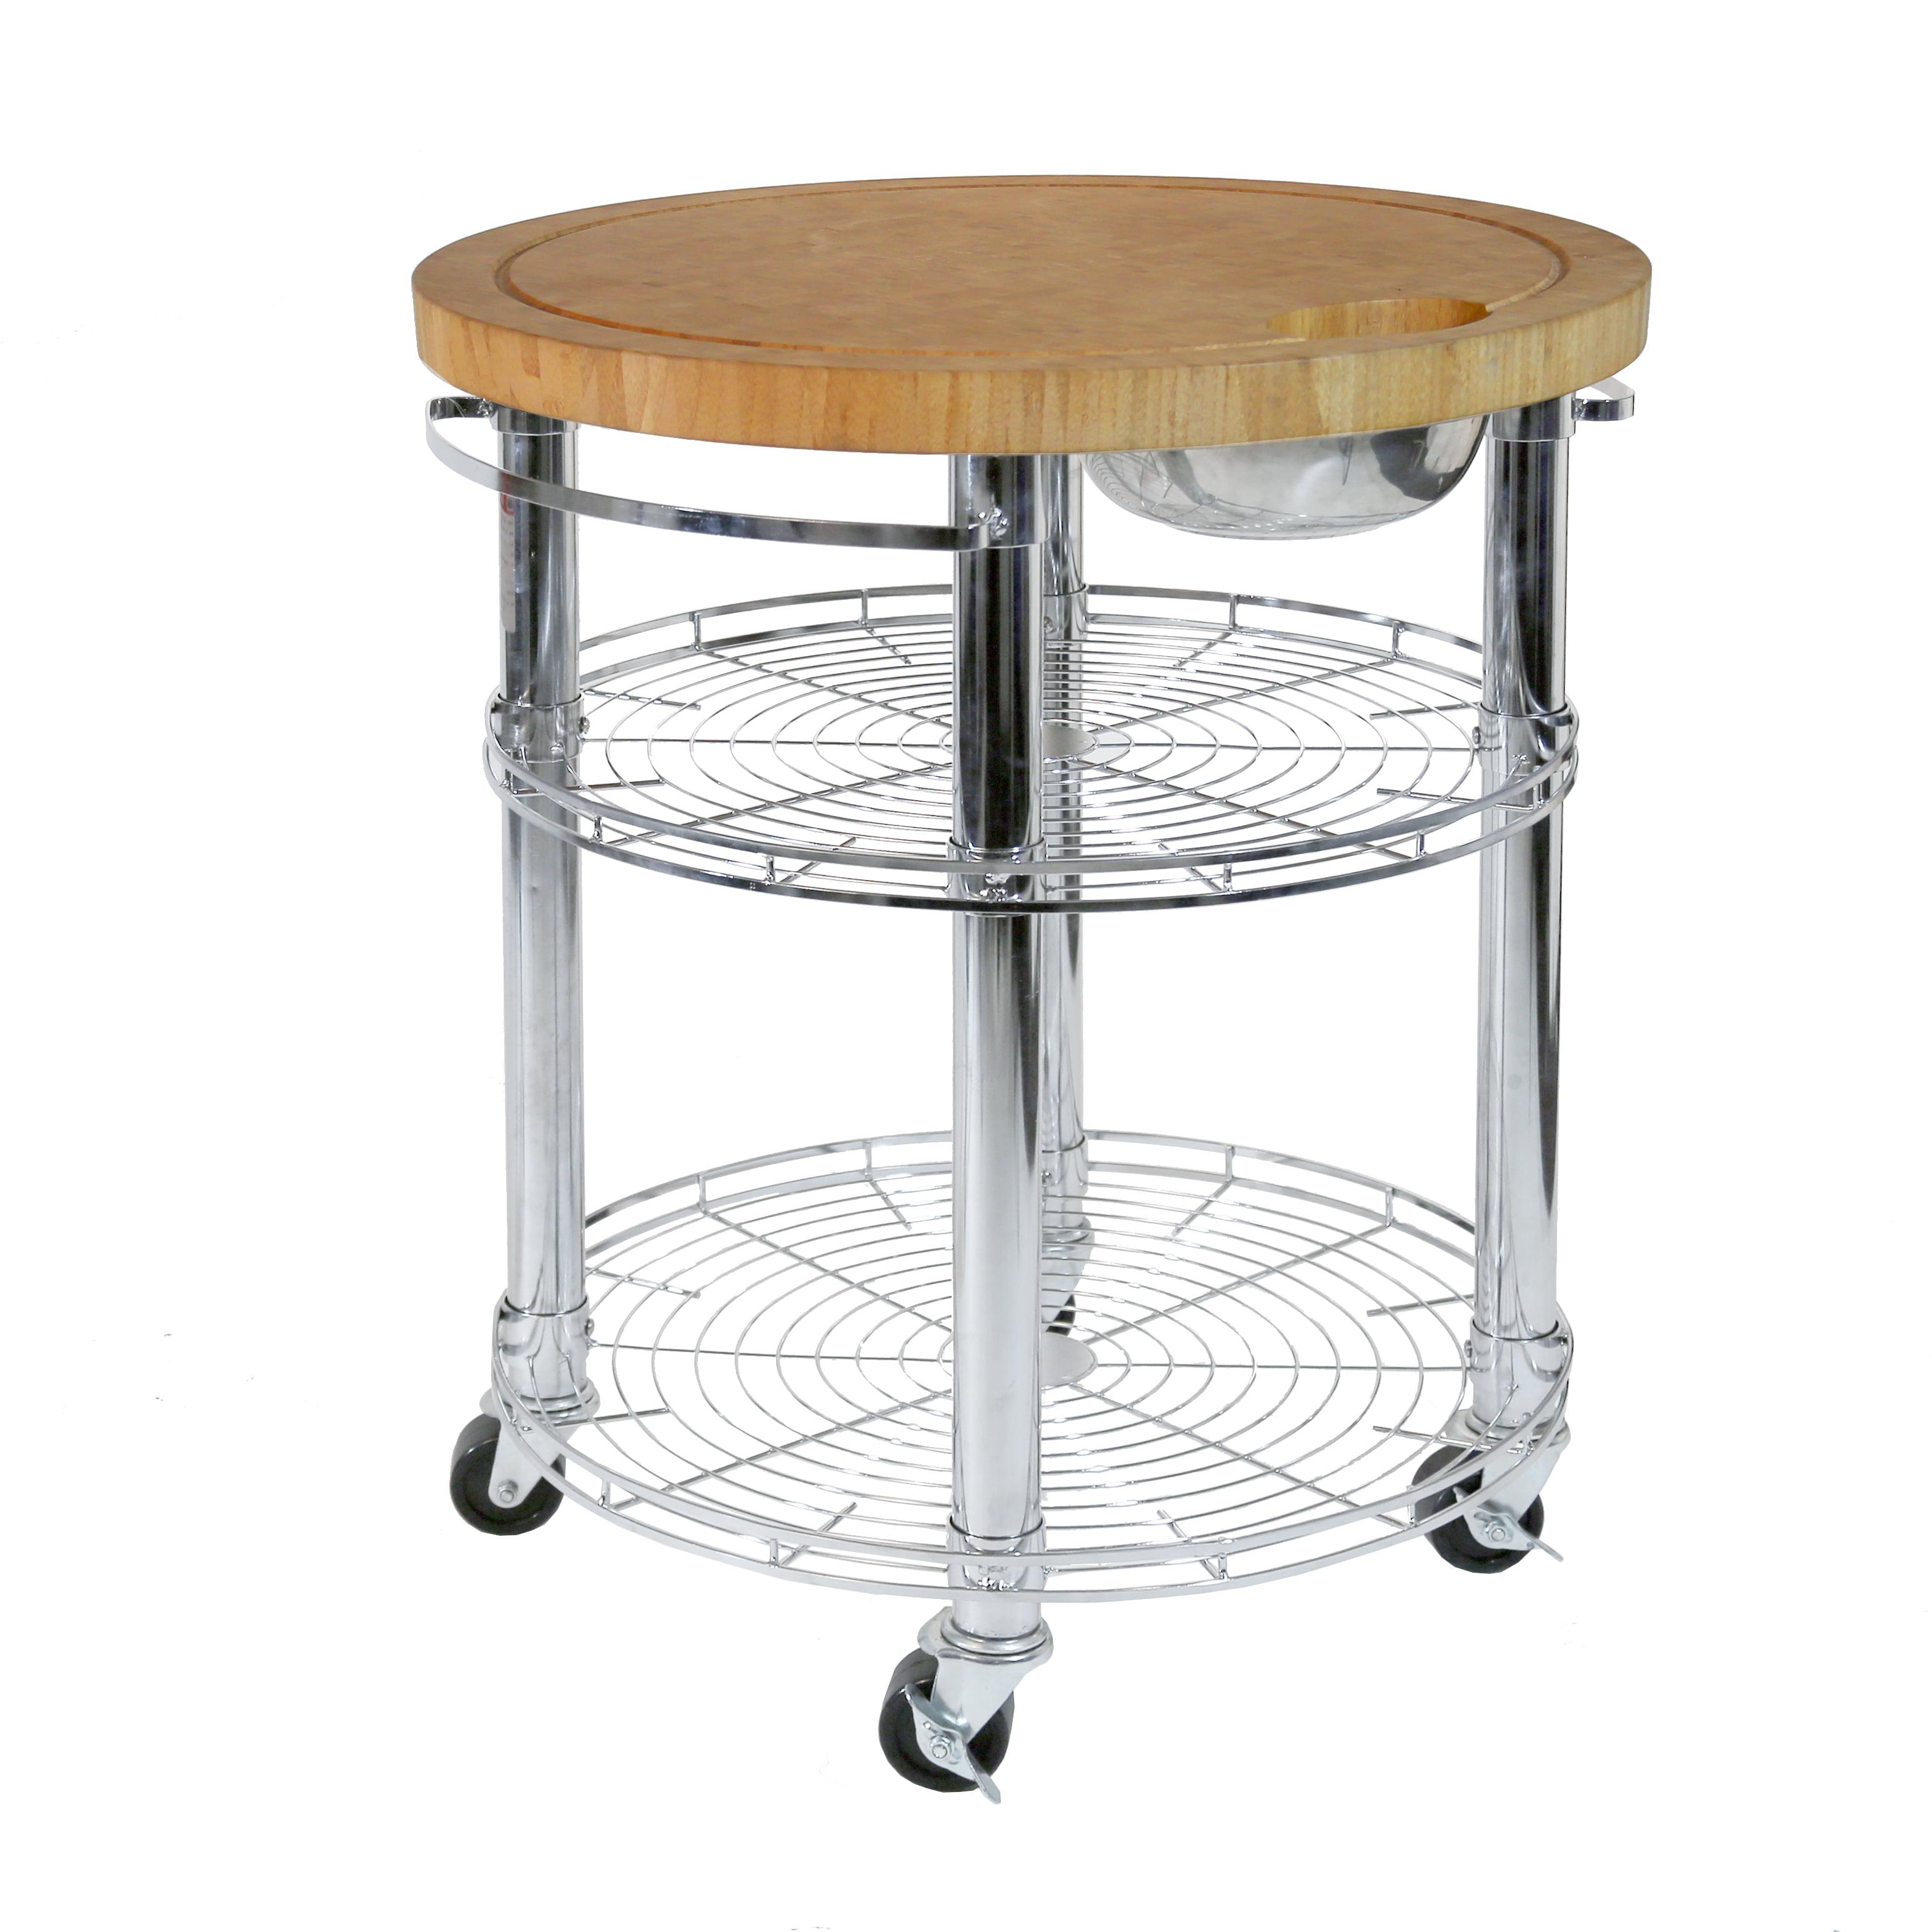 "Kitchen/BBQ Island Cart with Storage, 30"" W x 30"" D x 36"" H by Seville Classics"